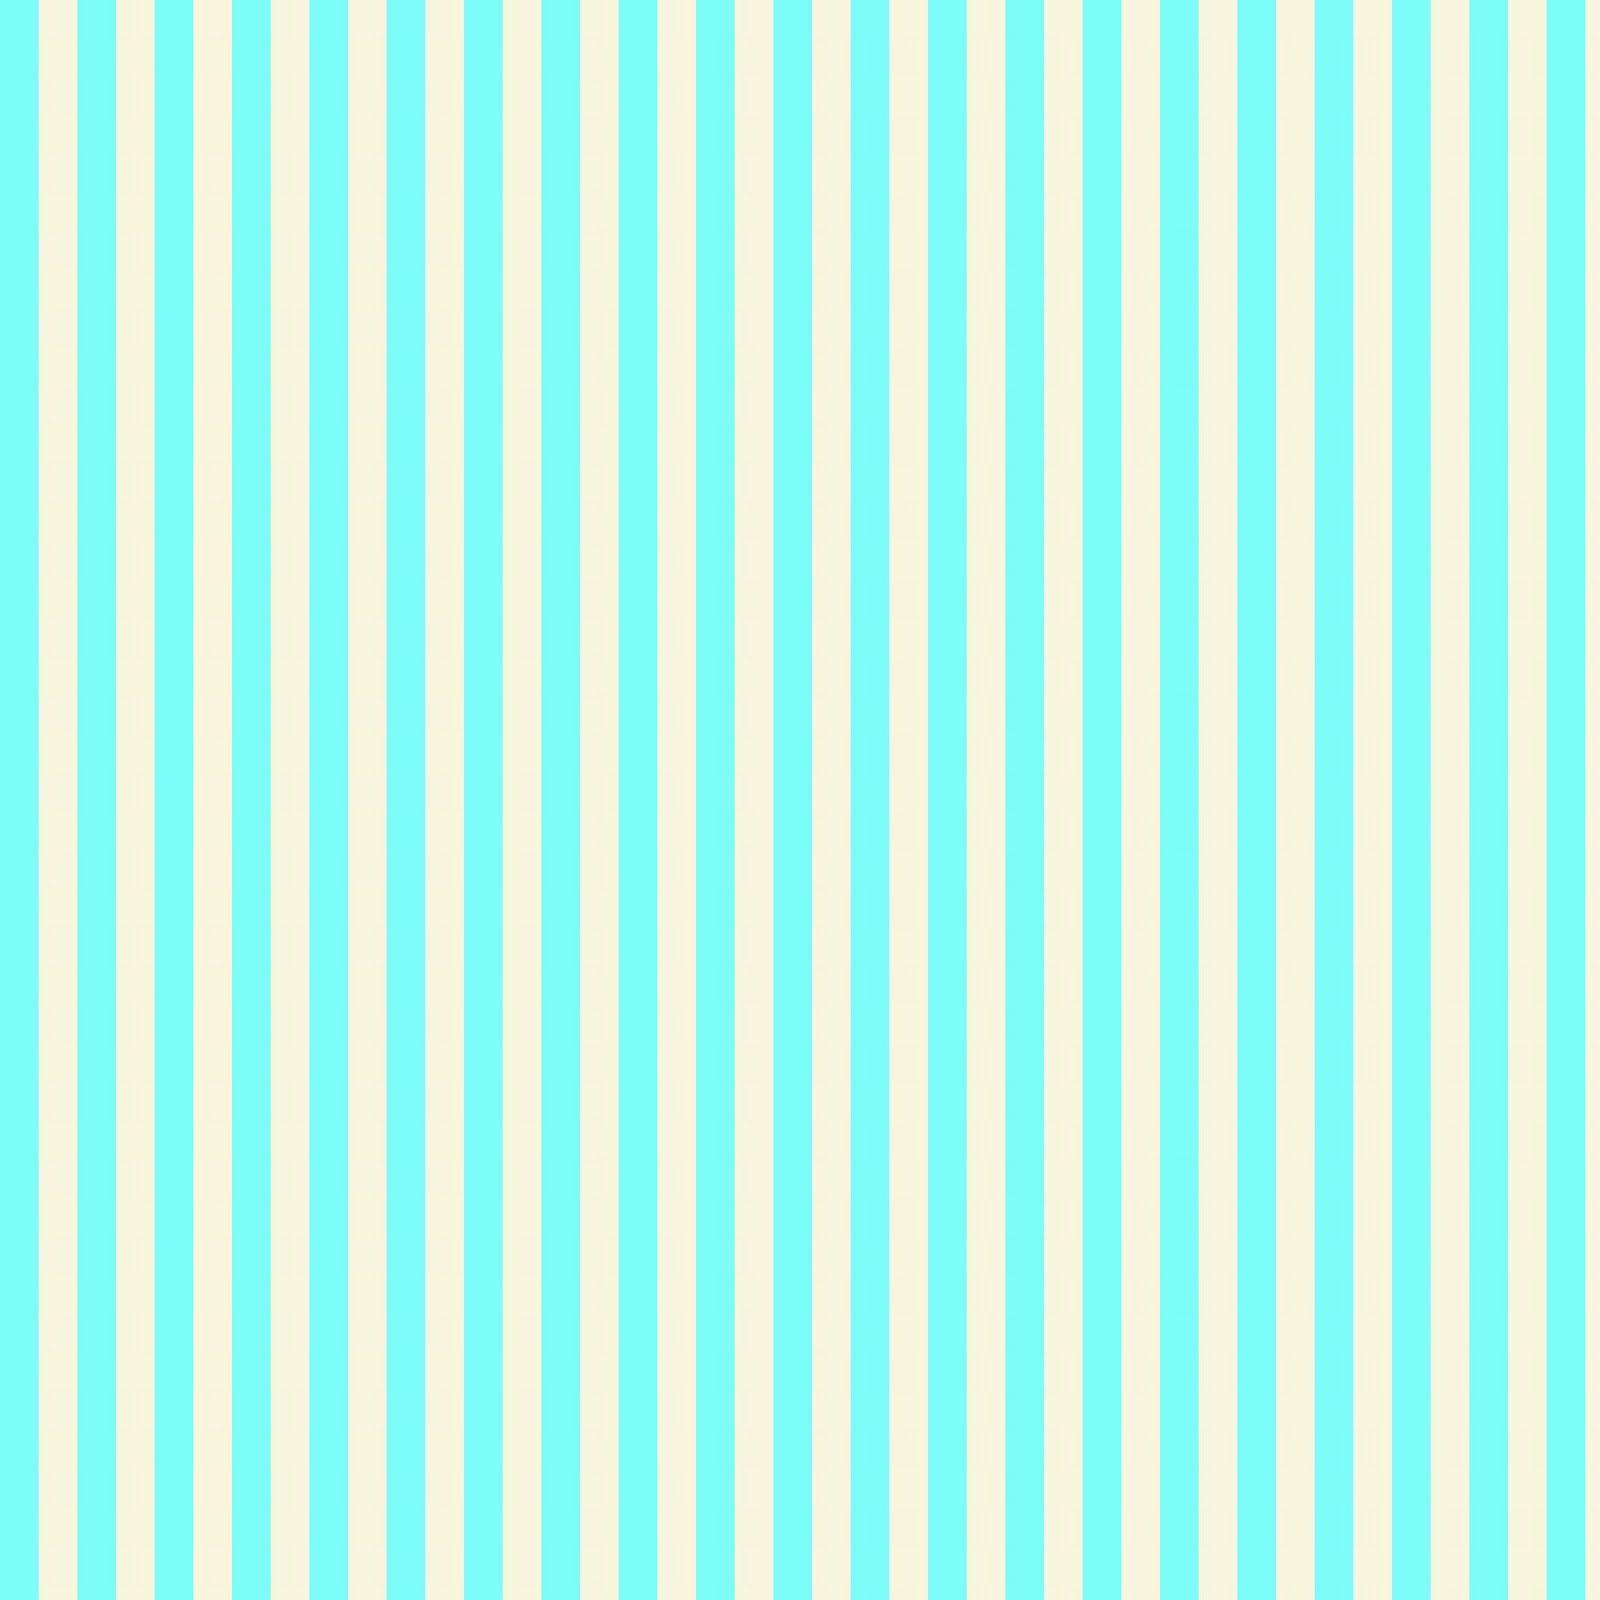 Aqua cream stripes from free vintage digital stamps for Papel decorativo rayas